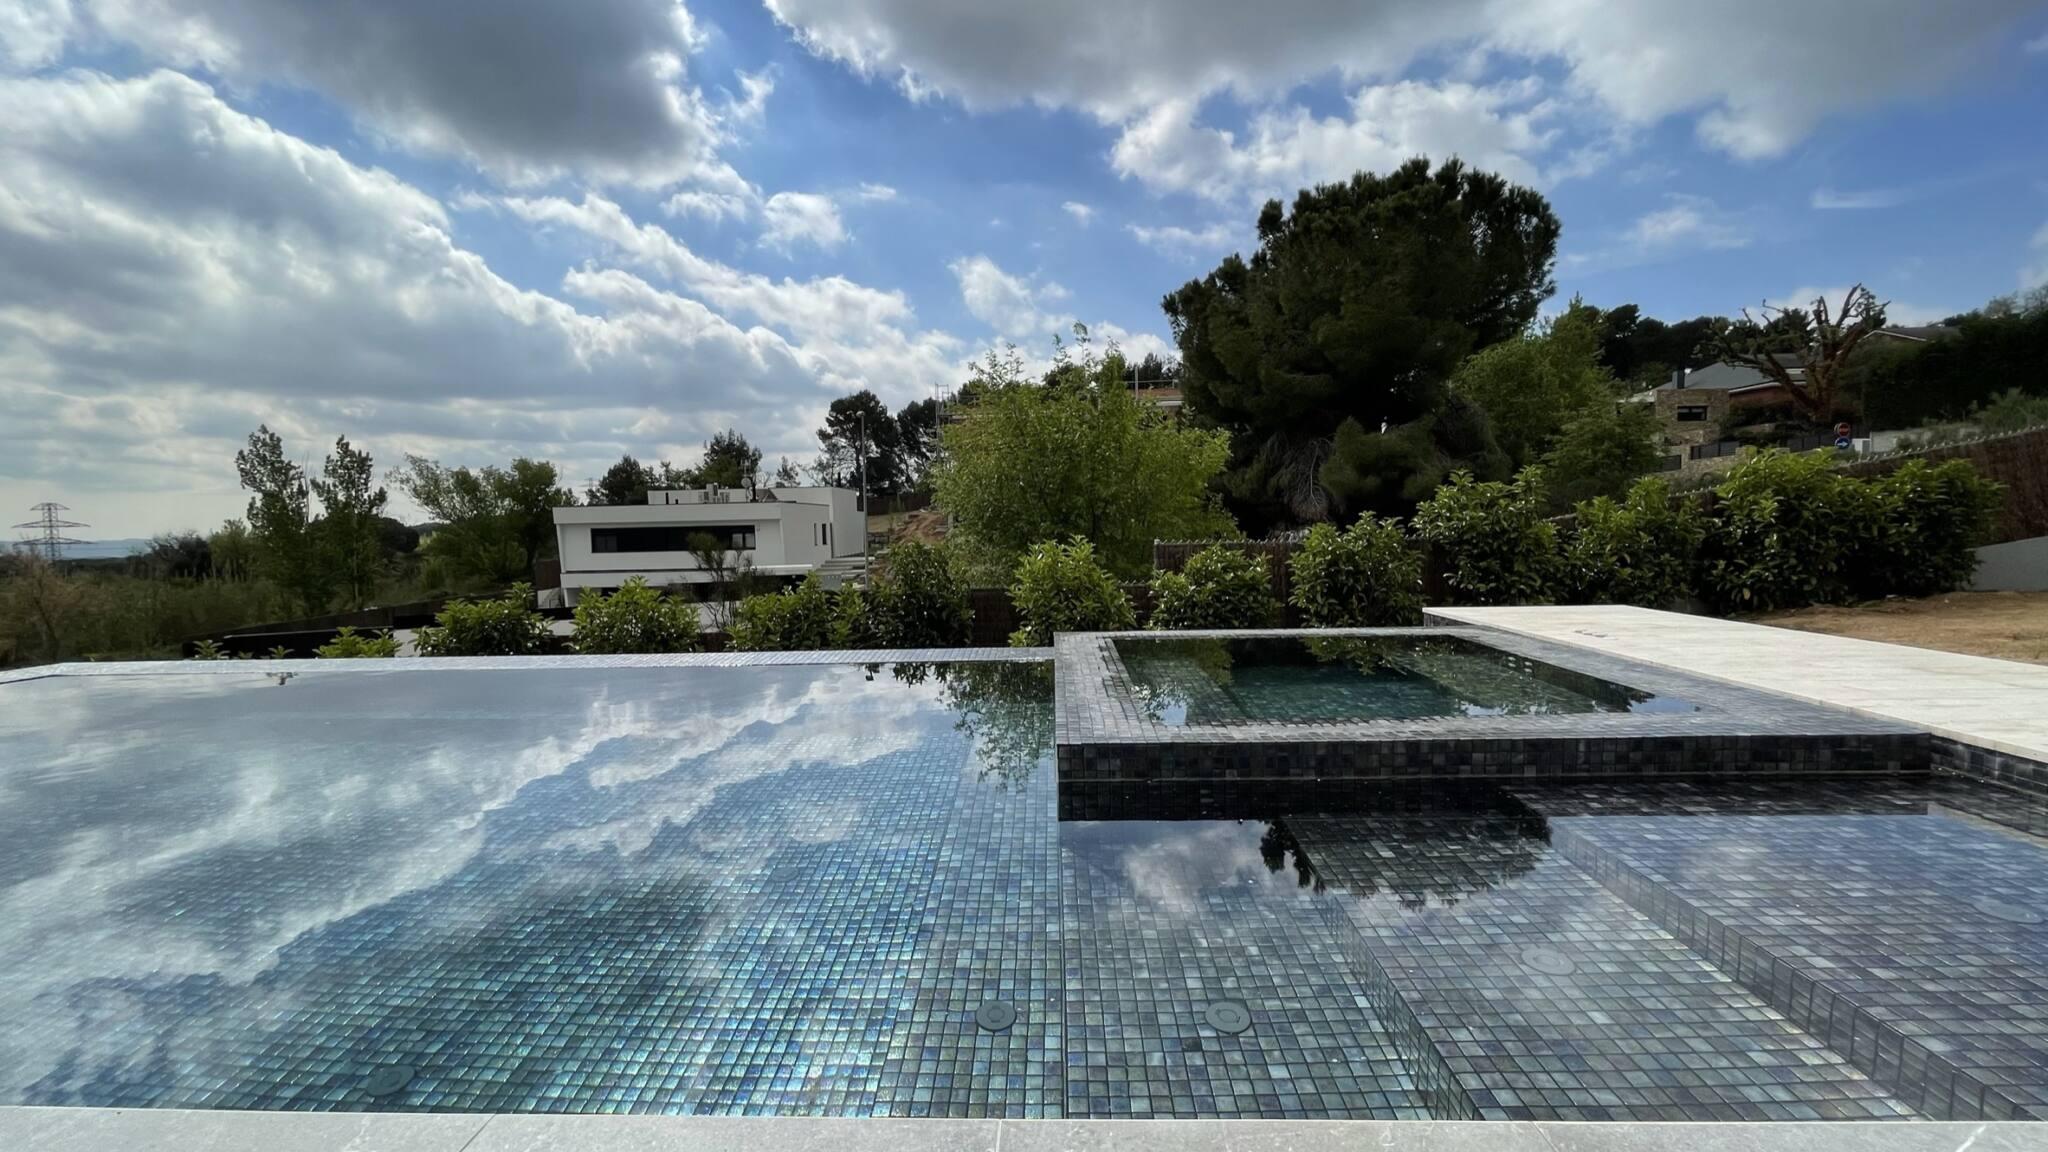 Proyecto-hisbalit-Piscina privada Milo | Vazquez i Benages-